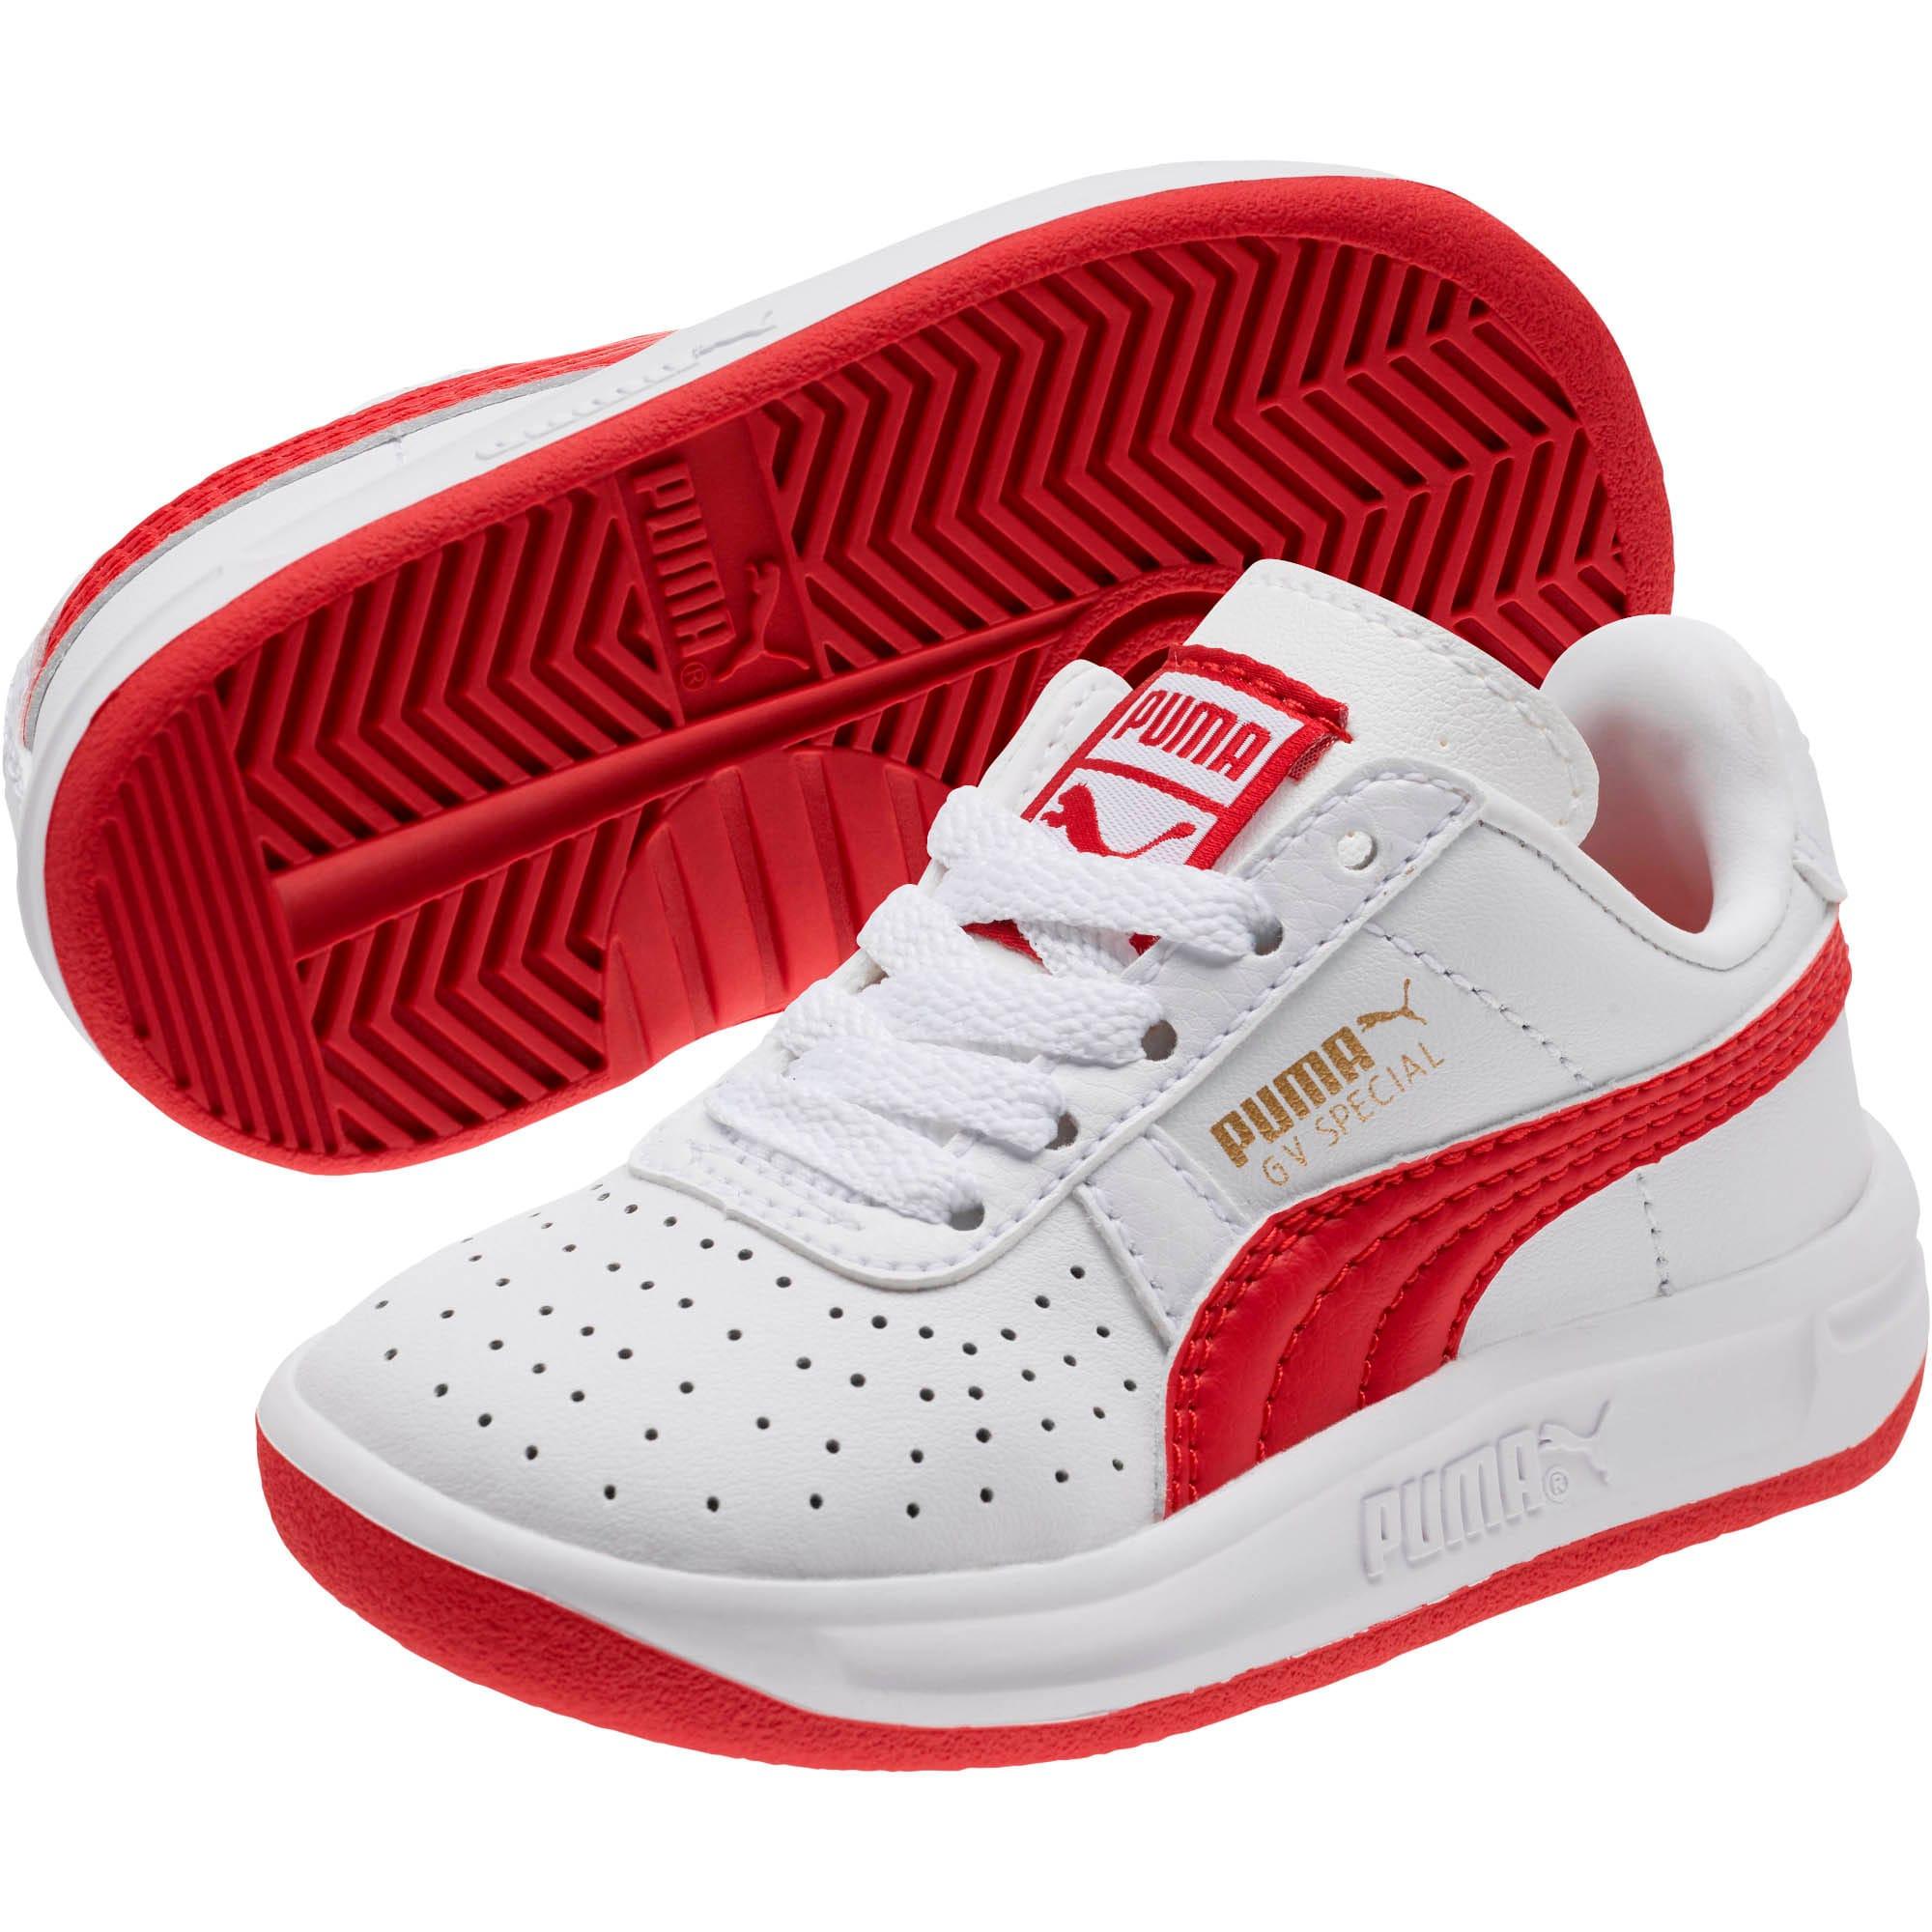 Thumbnail 2 of GV Special Toddler Shoes, Puma White-Ribbon Red, medium